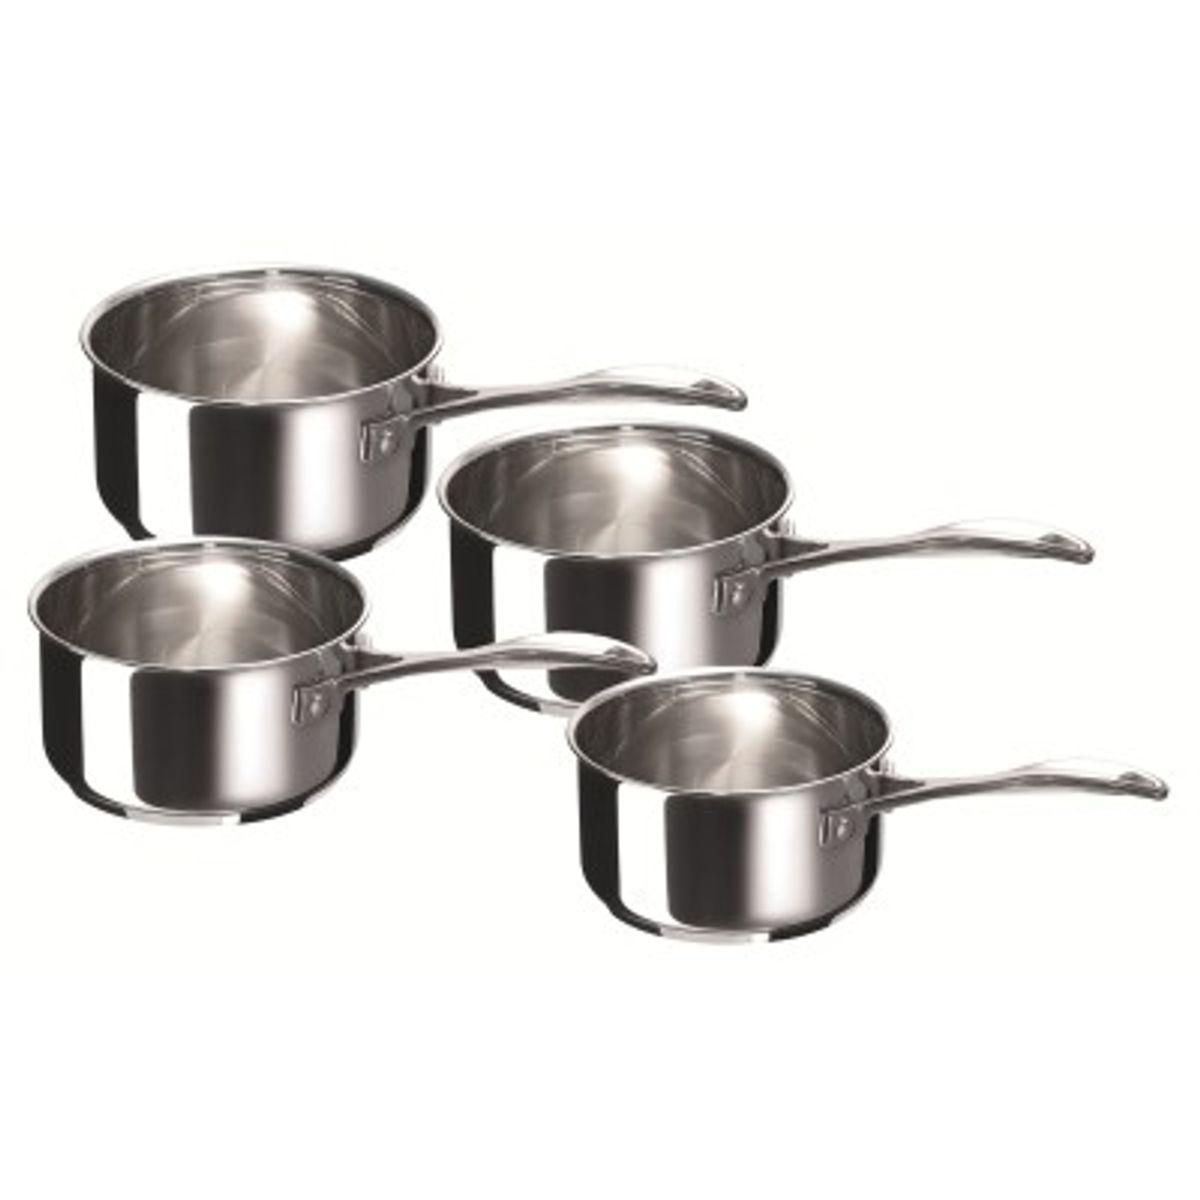 Set 4 casseroles chef 14/16/18/20cm - Beka